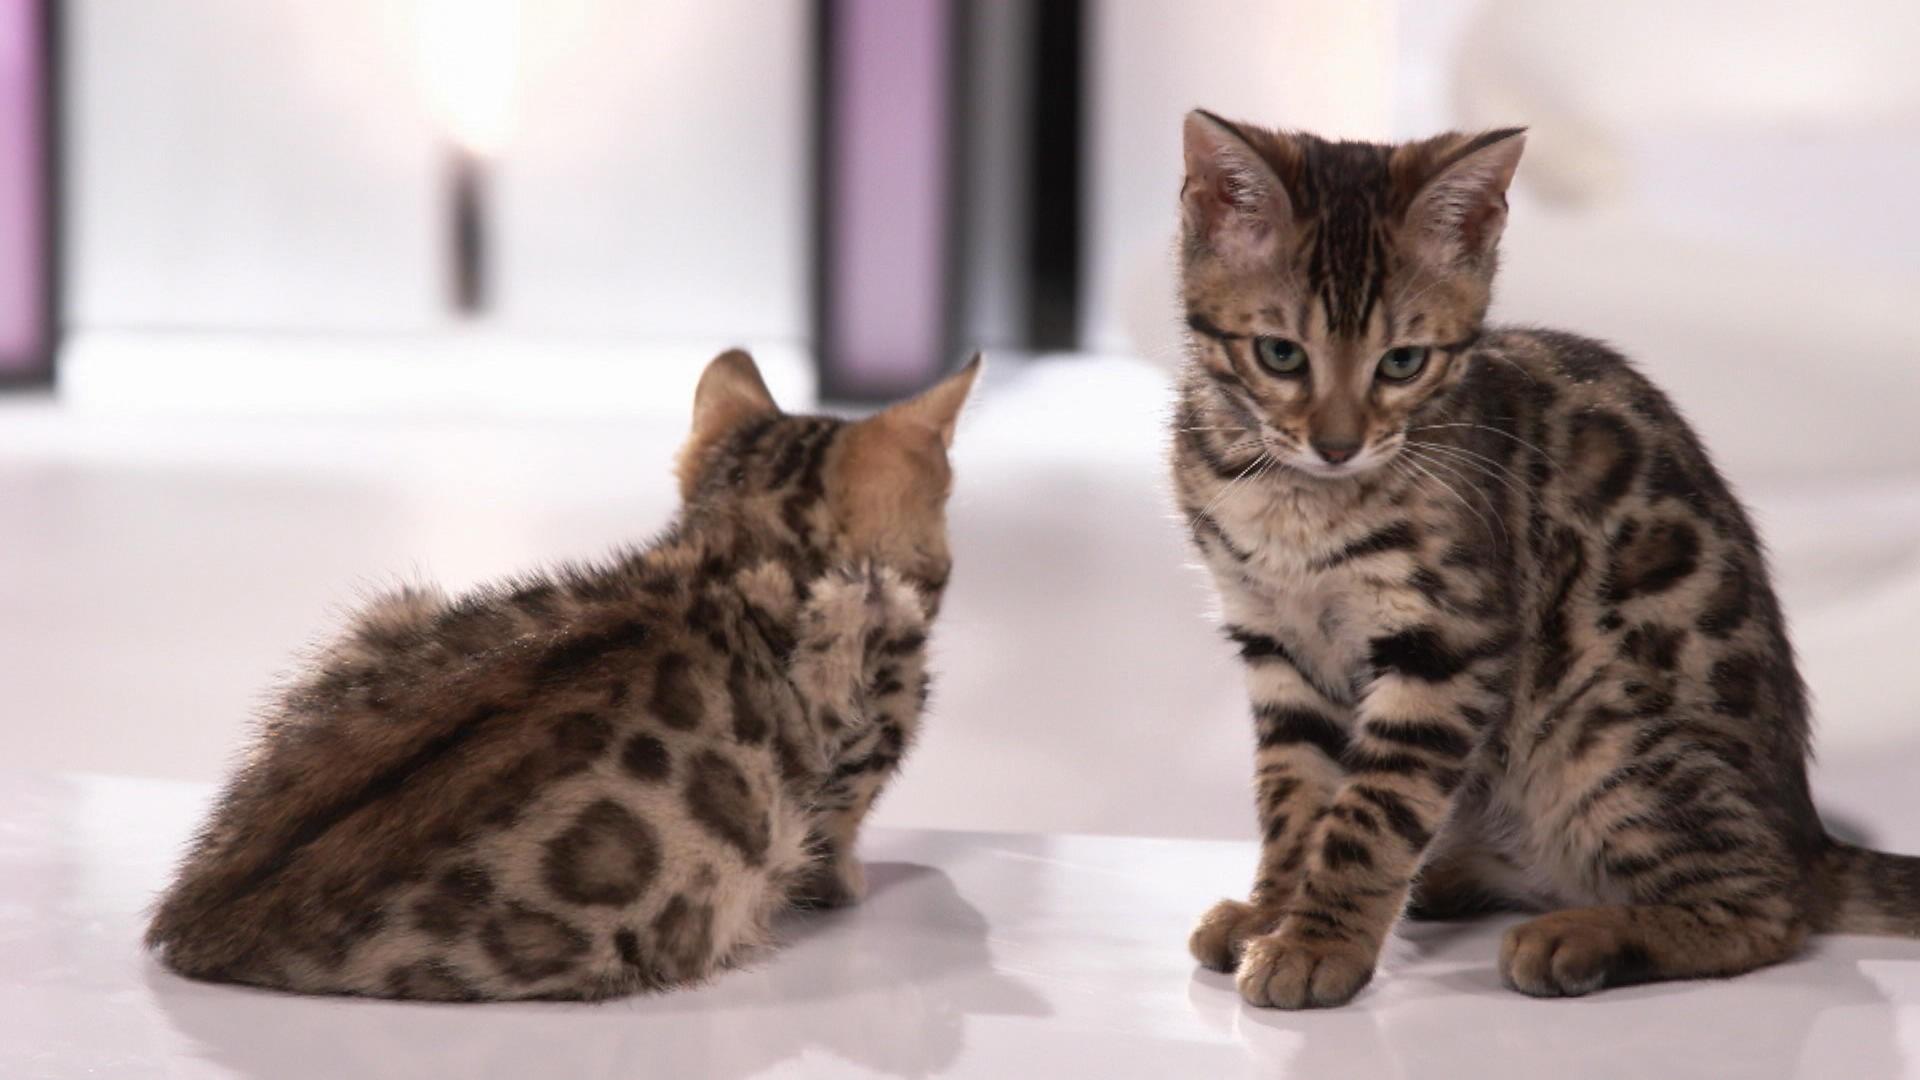 le chat de bengal 100 animal zone vid o t l qu bec. Black Bedroom Furniture Sets. Home Design Ideas